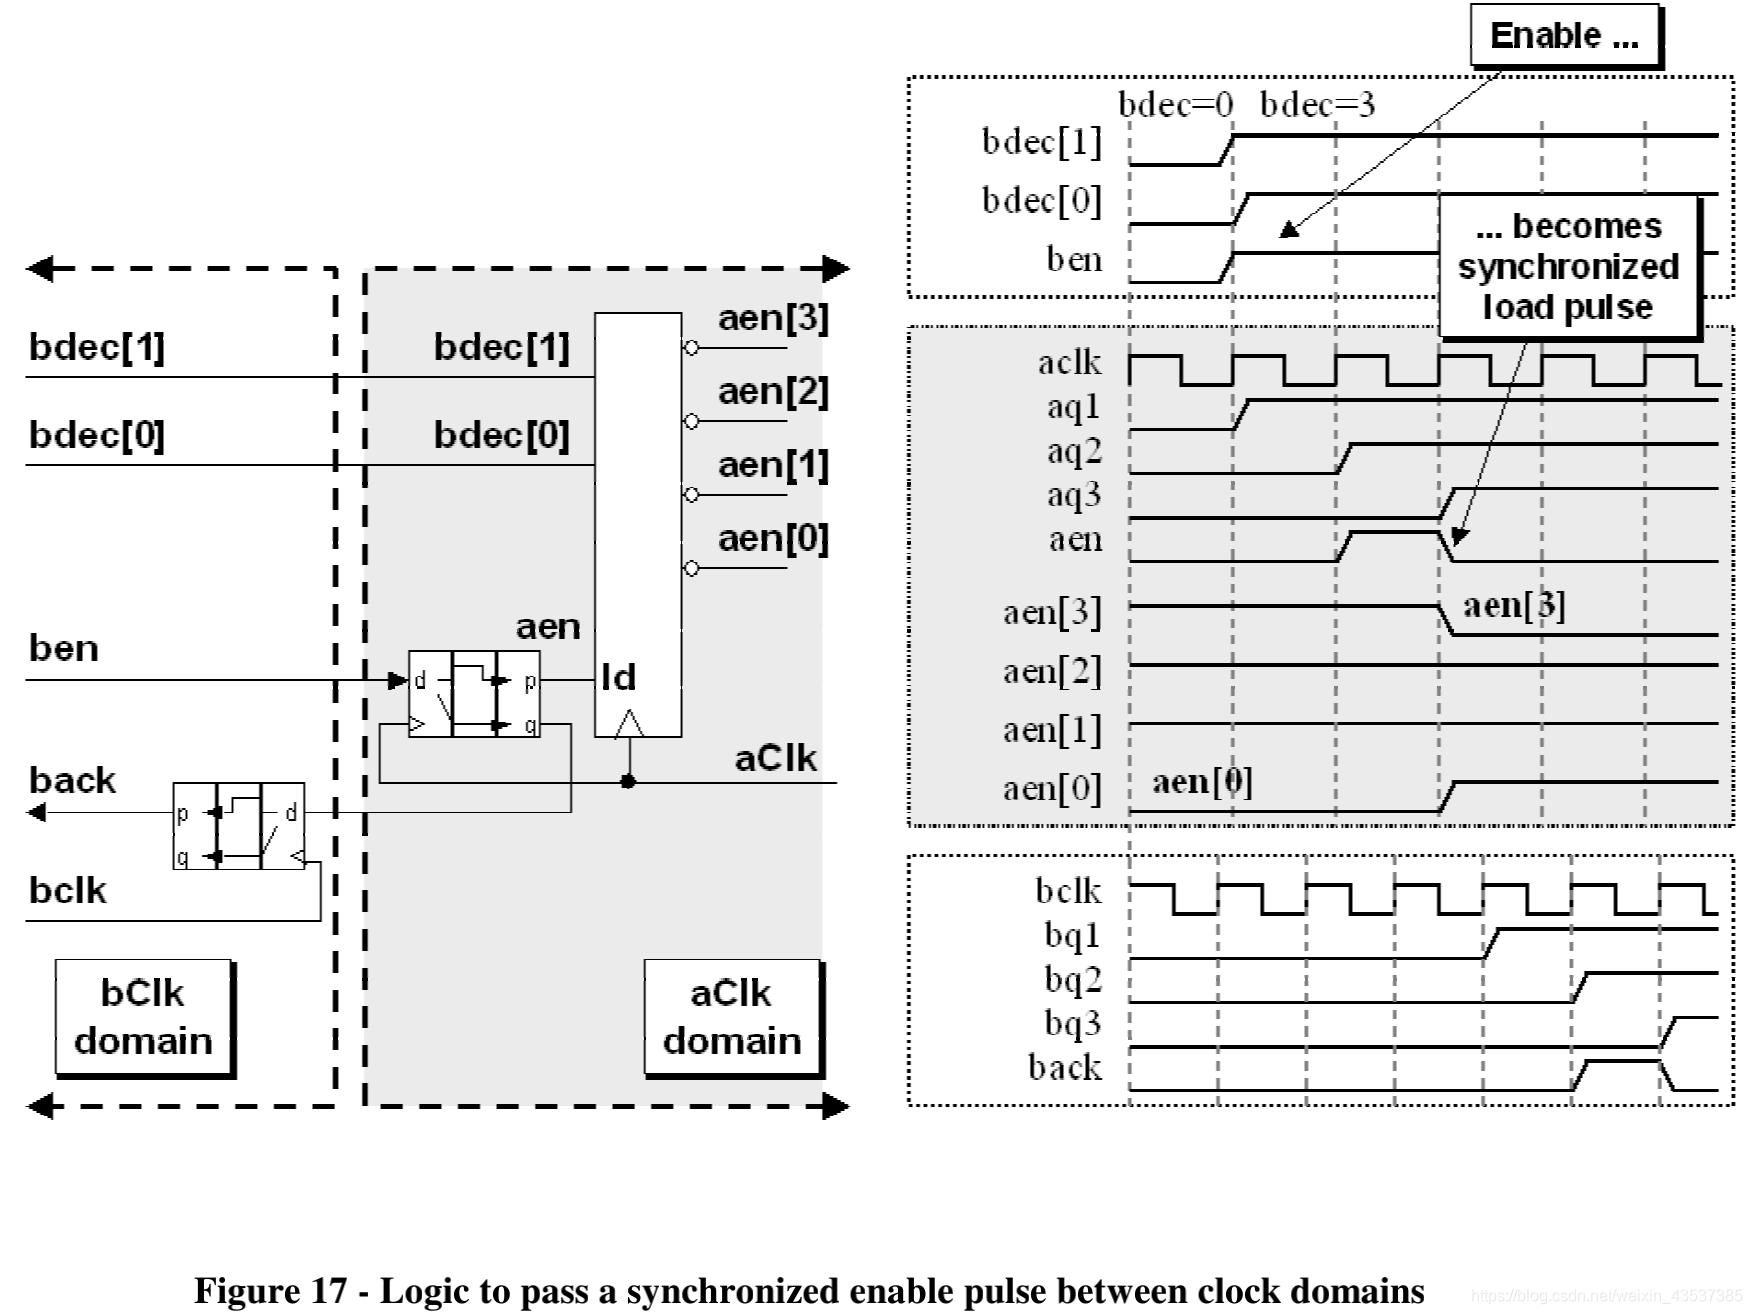 《Clock Domain Crossing》 翻译与理解(5)多信号跨时钟域传输